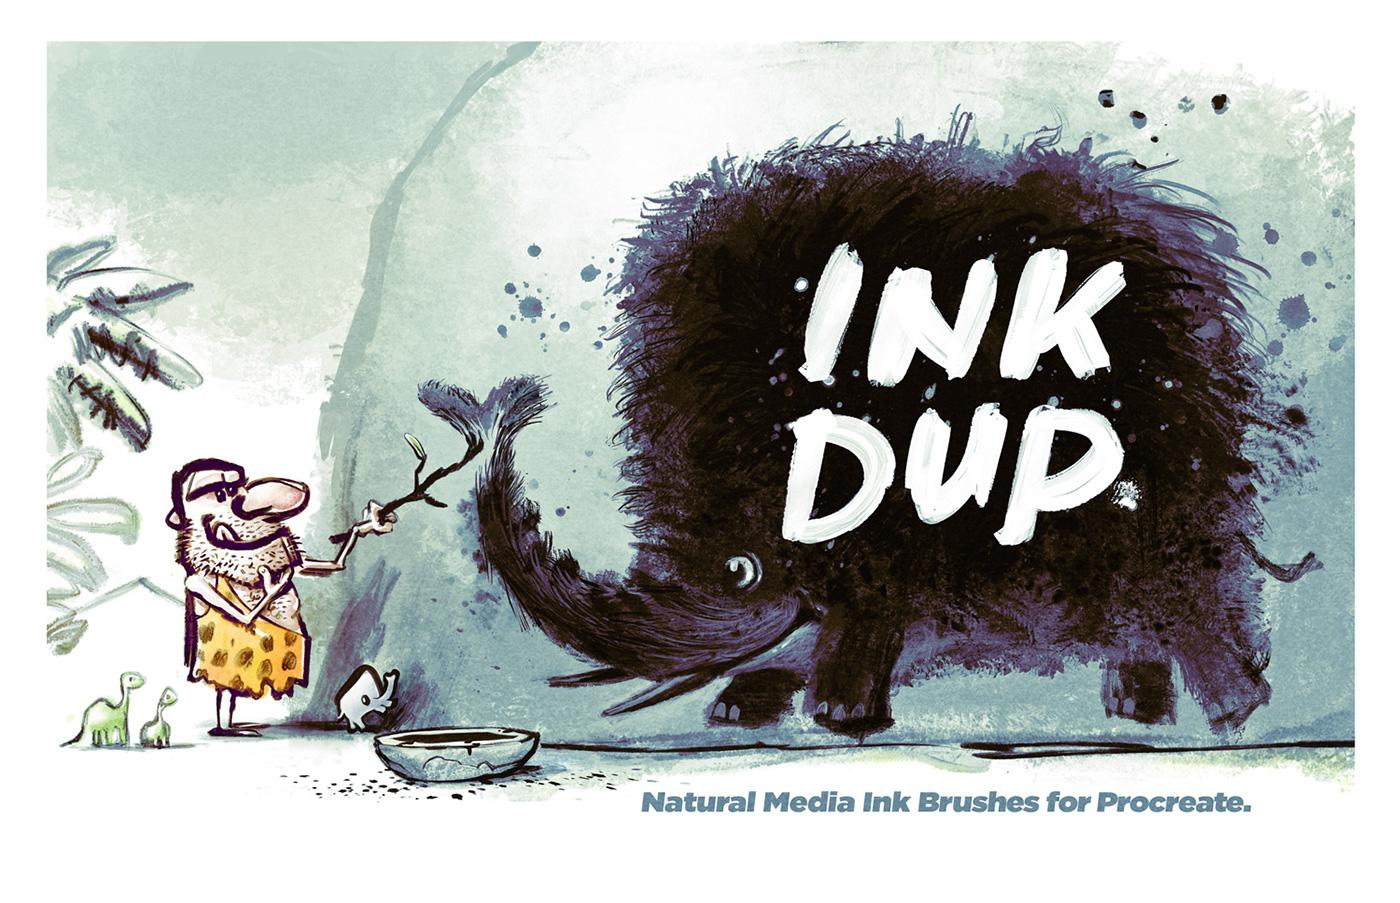 INK DUP: Natural Media Ink Brushes for Procreate  on Behance